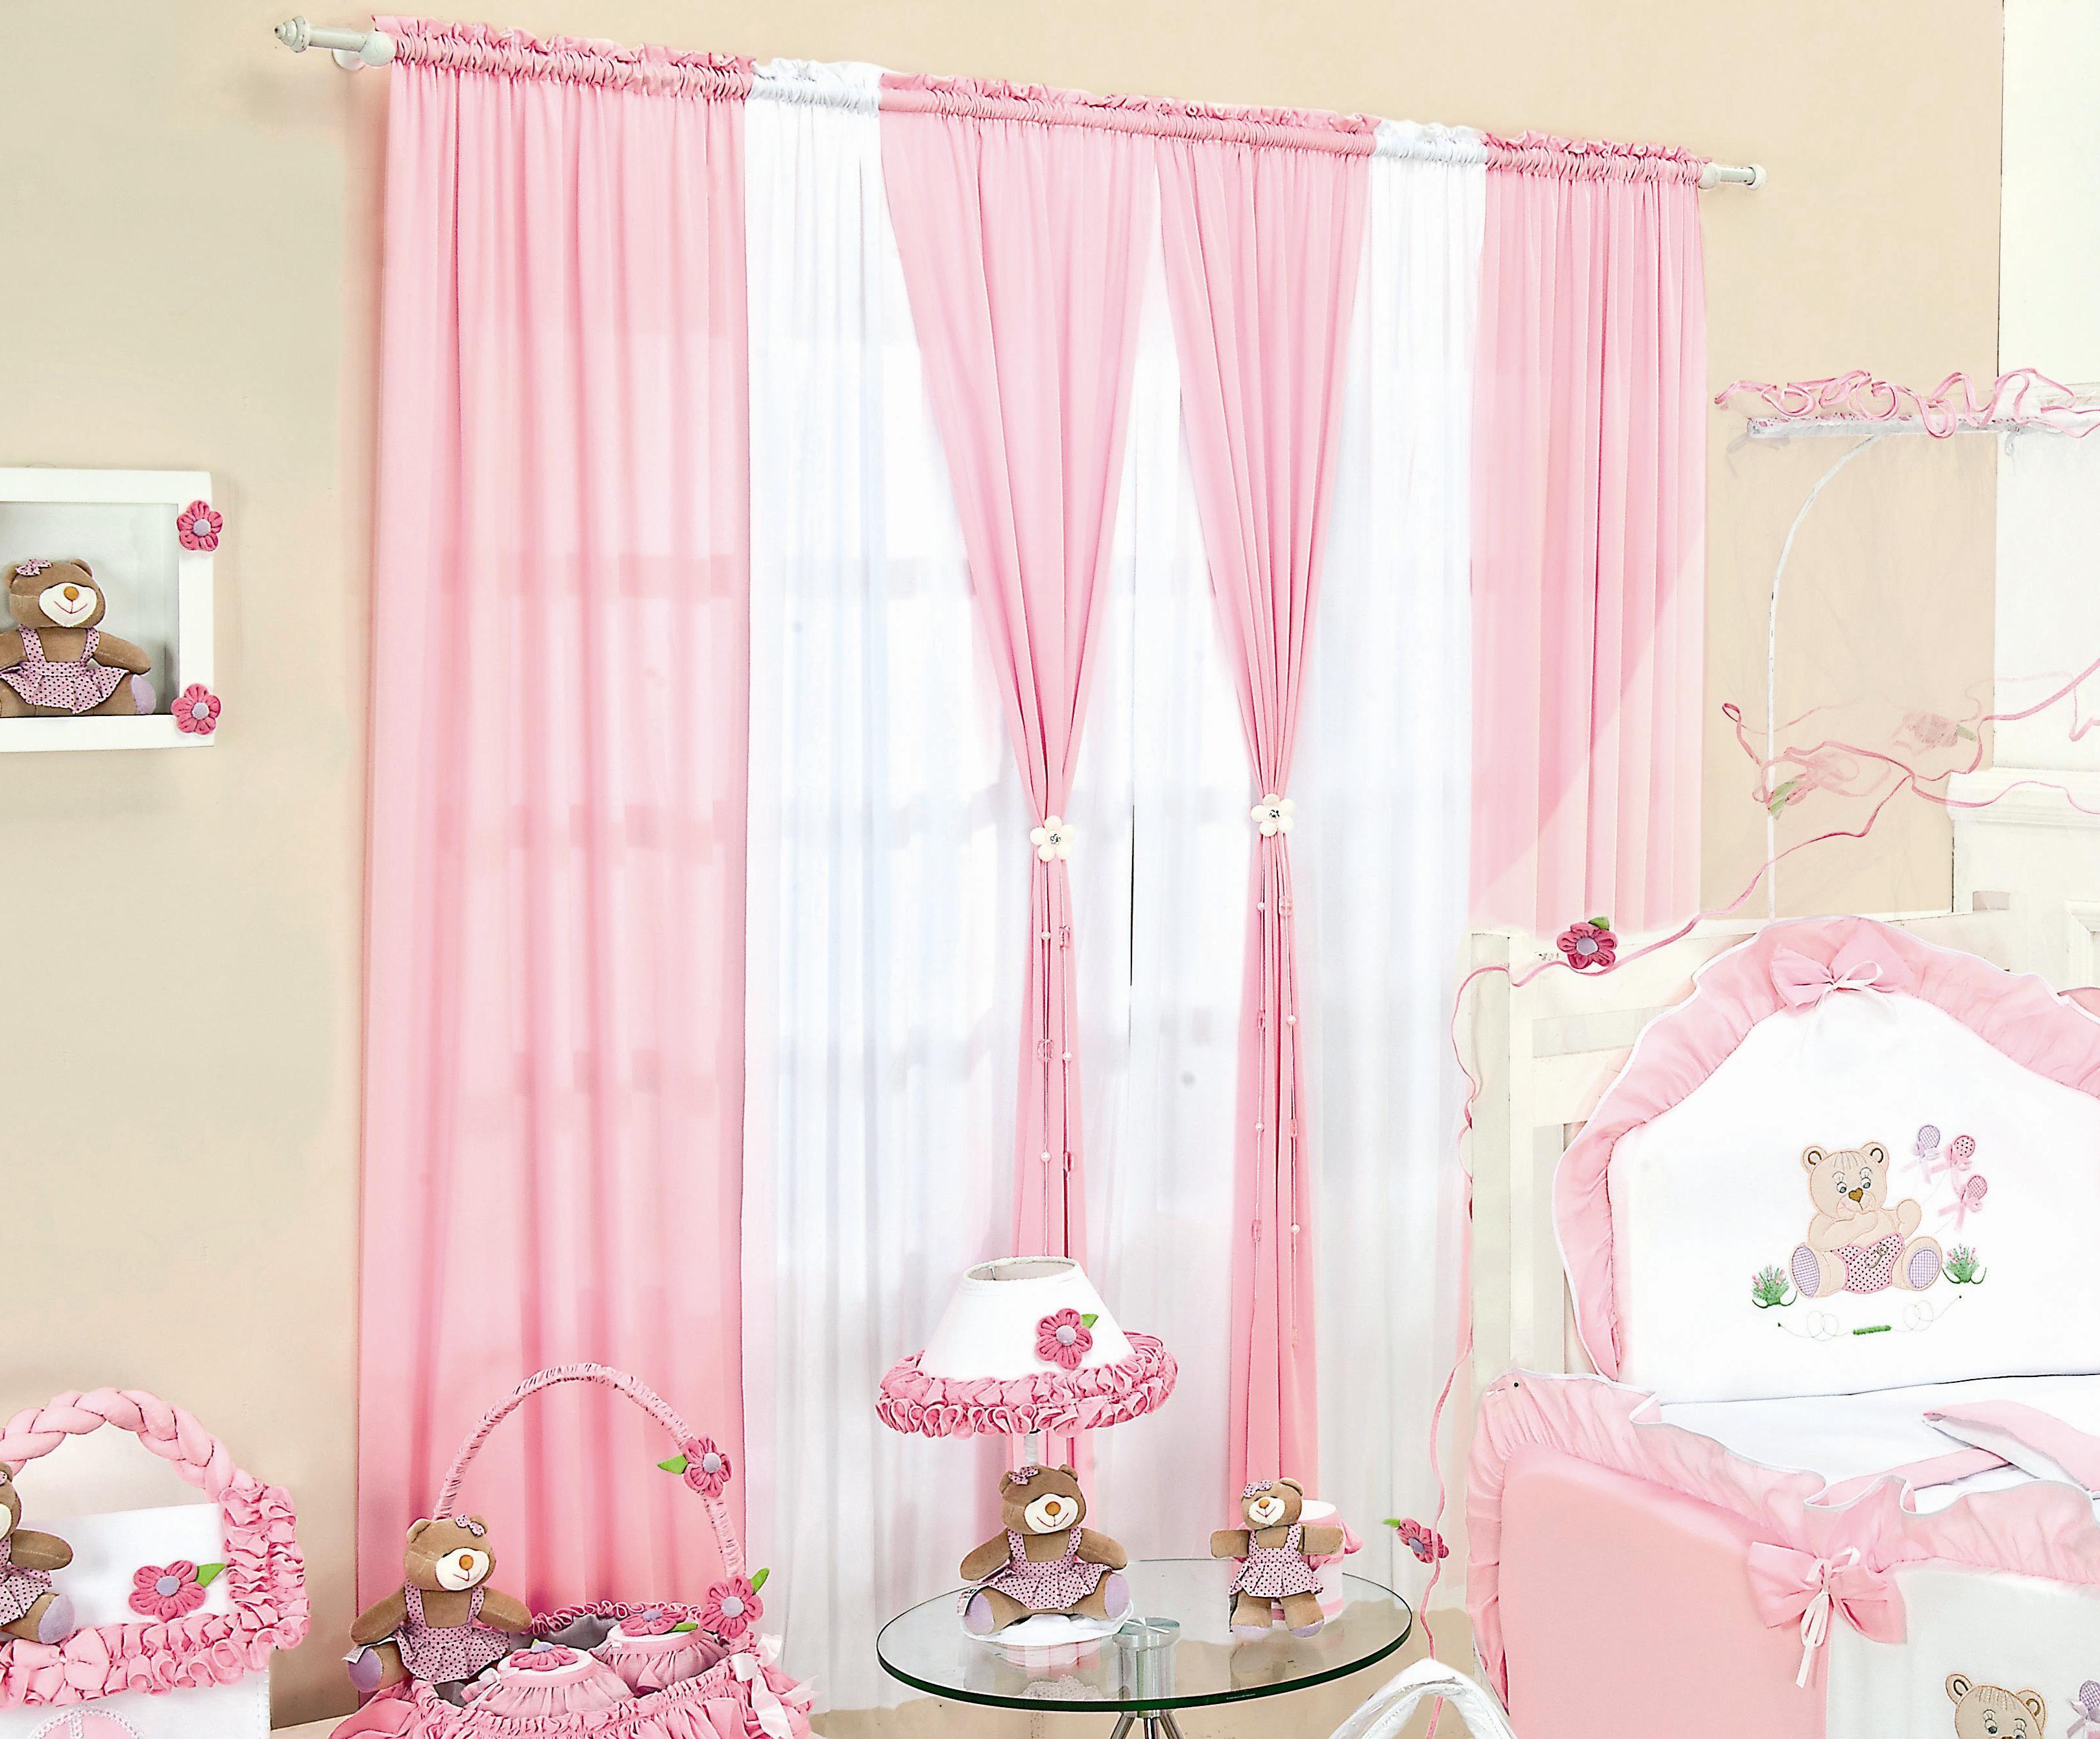 20170218161046 tipos de cortina para quarto de bebe - Cortinas para bebe ...